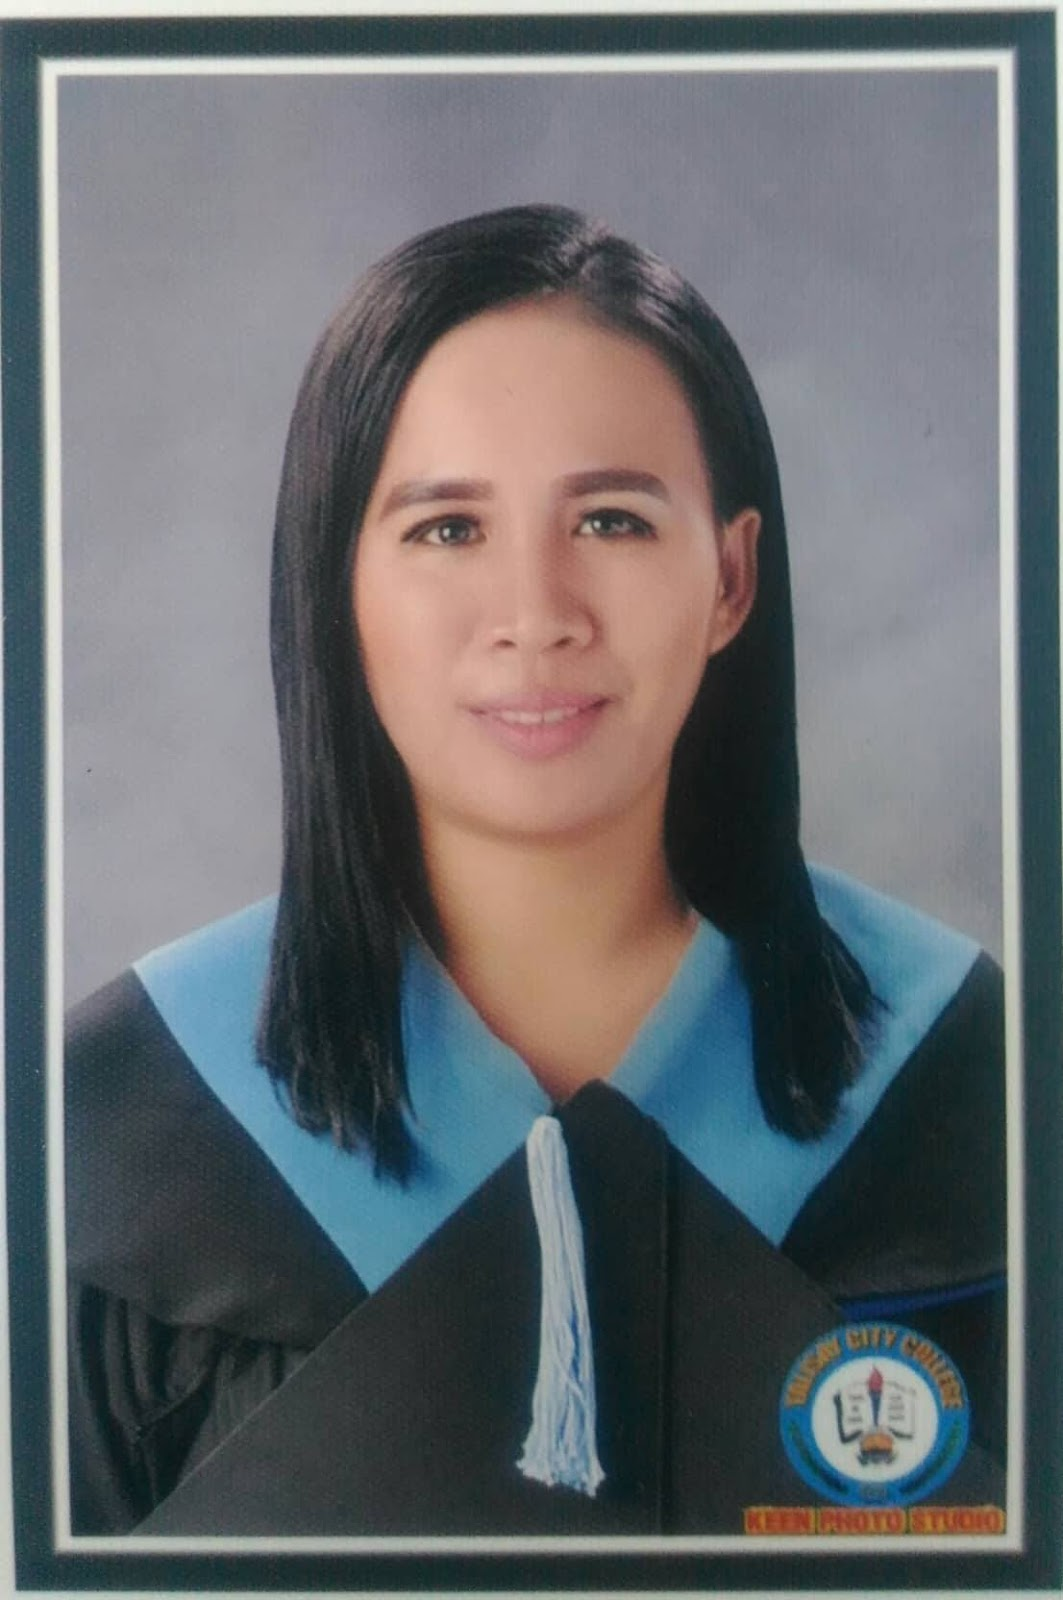 House helper graduates magna cum laude Cebu